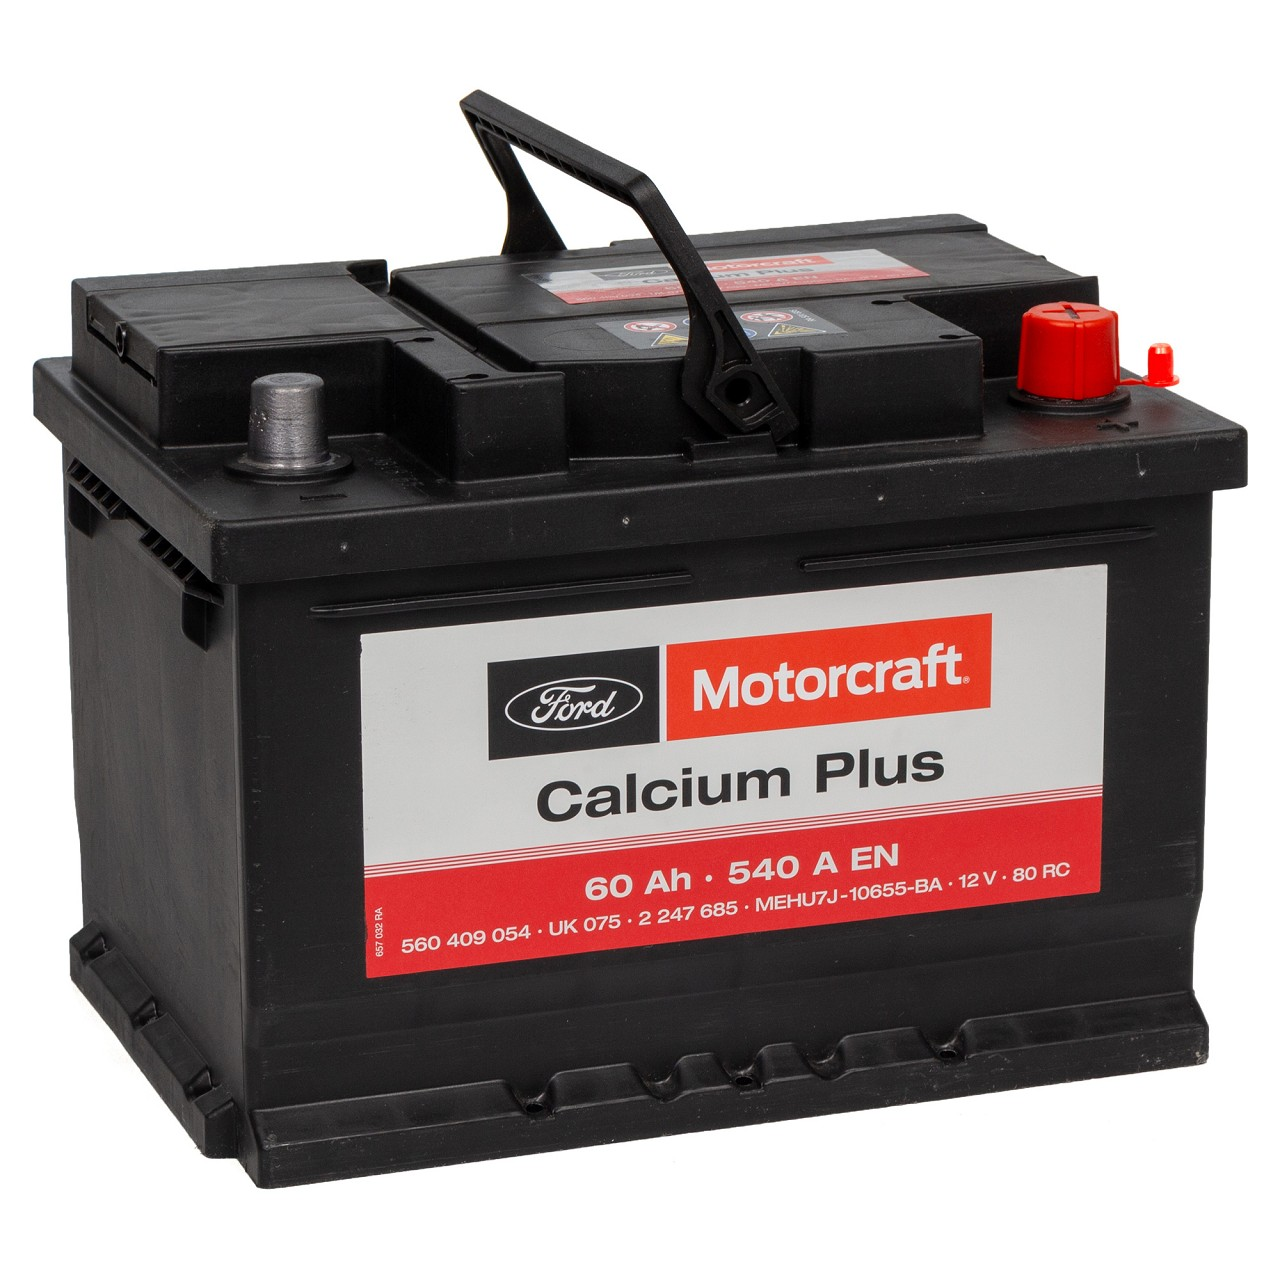 ORIGINAL Ford MOTORCRAFT Autobatterie Starterbatterie 12V 60Ah 2247685